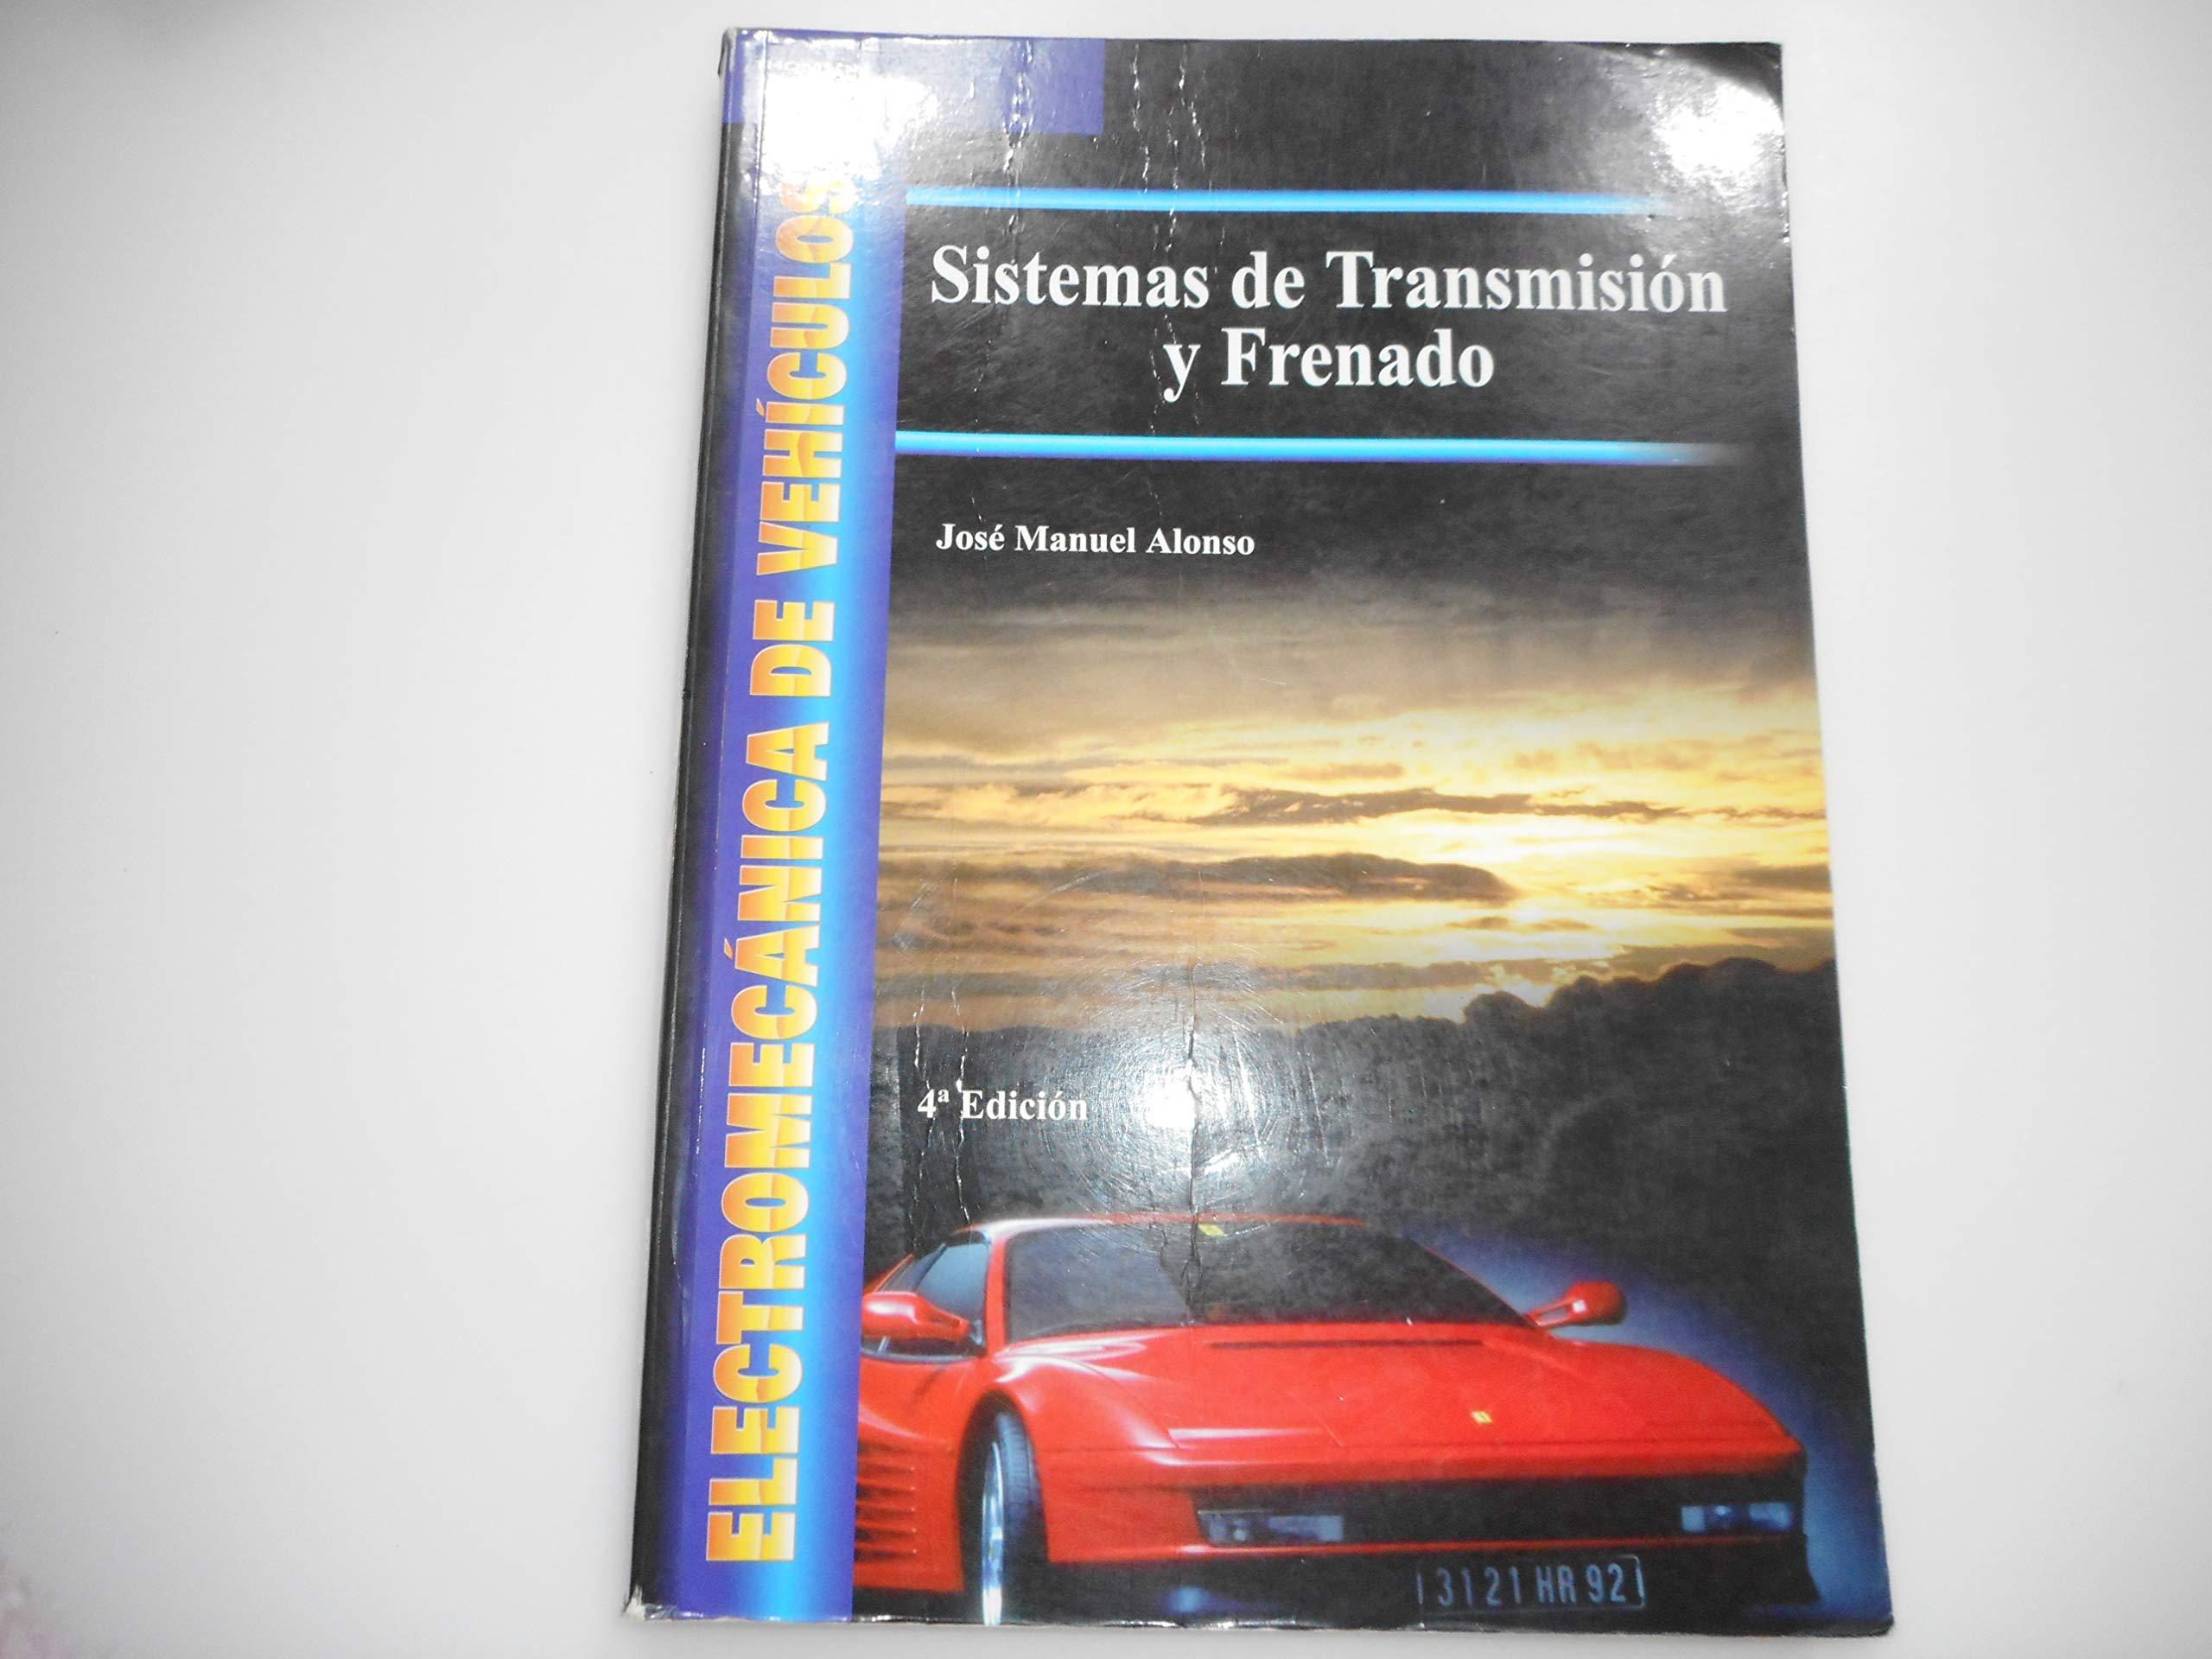 Sistemas de Transmision y Frenado (Spanish Edition) (Spanish) Paperback – October, 2001